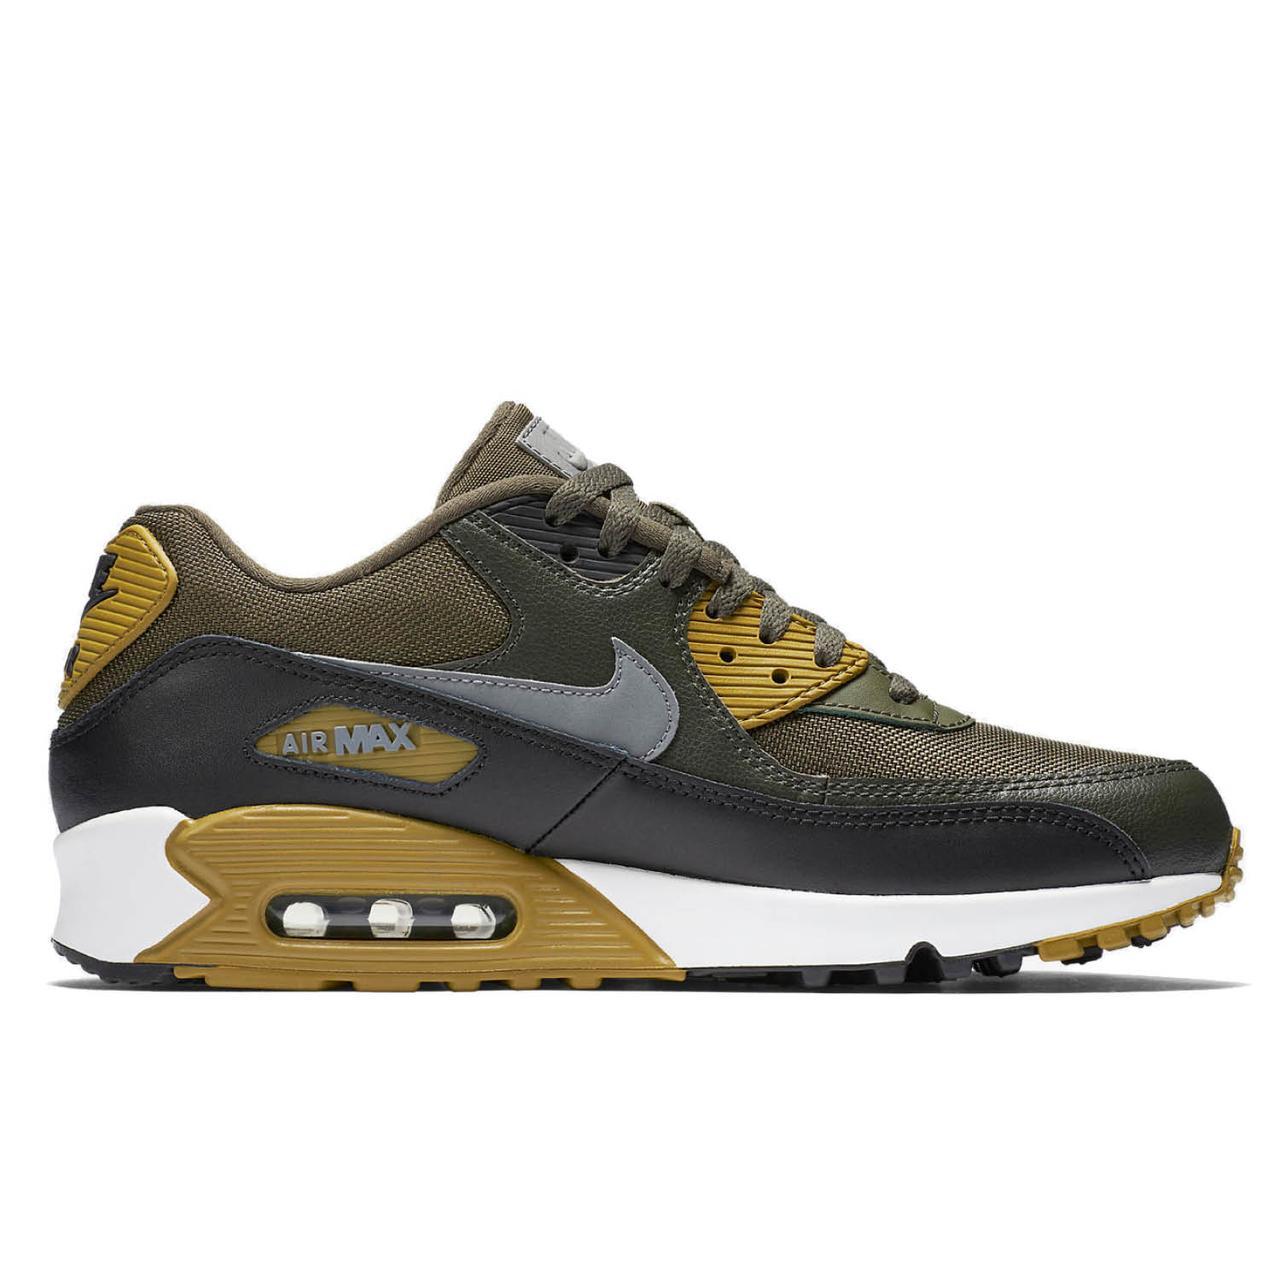 9324b1f7 Оригинальные кроссовки Nike Air Max 90 Essential Khaki White -  Sport-Sneakers - Оригинальные кроссовки